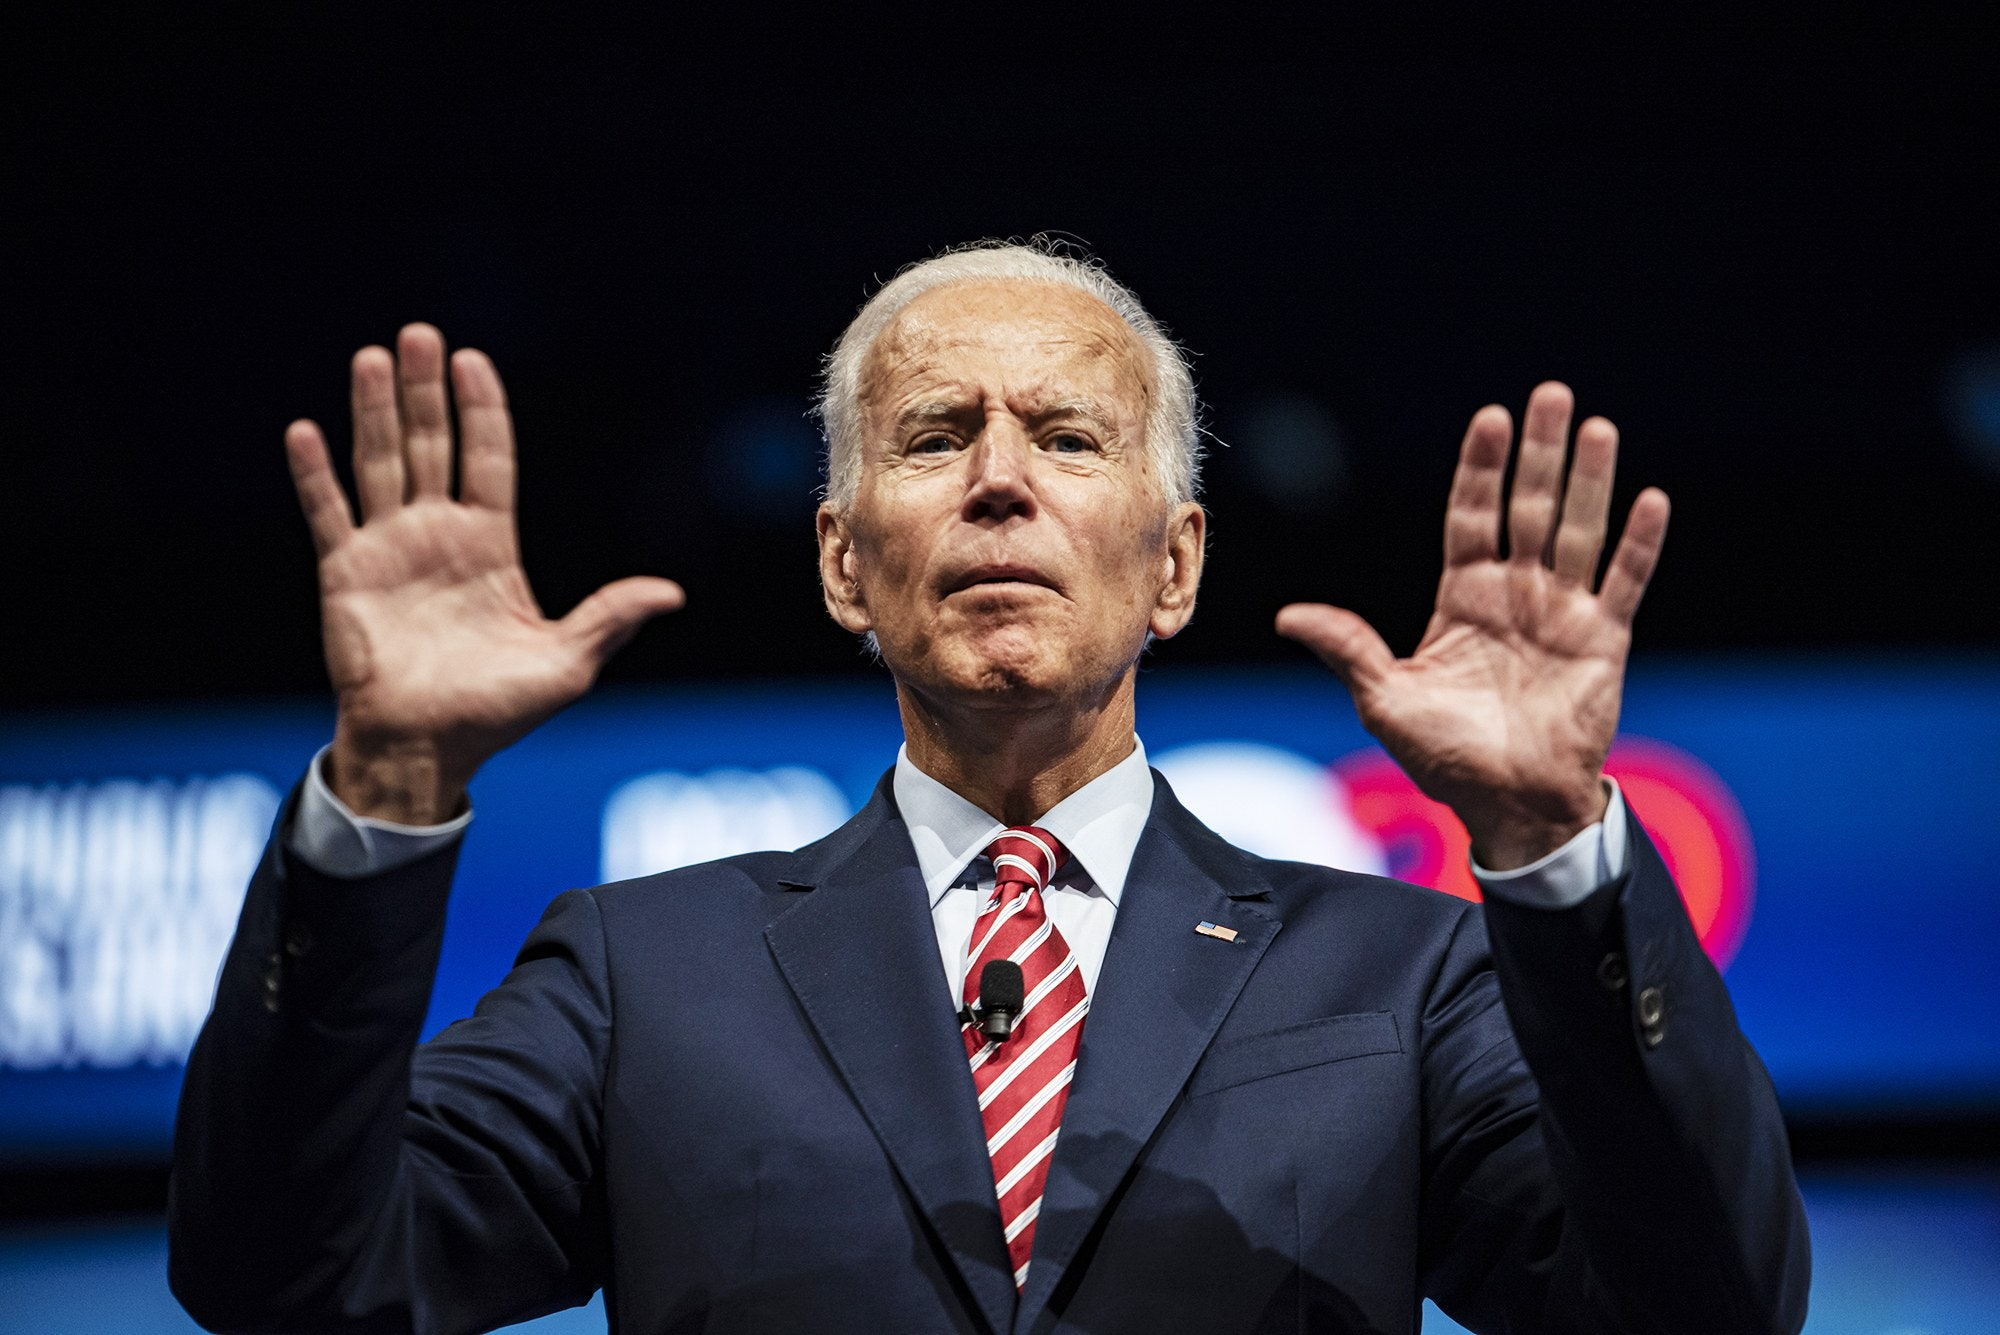 Joe Biden Slams Israel, Expresses 'Overwhelming Frustration' With Ben Netanyahu's Policies